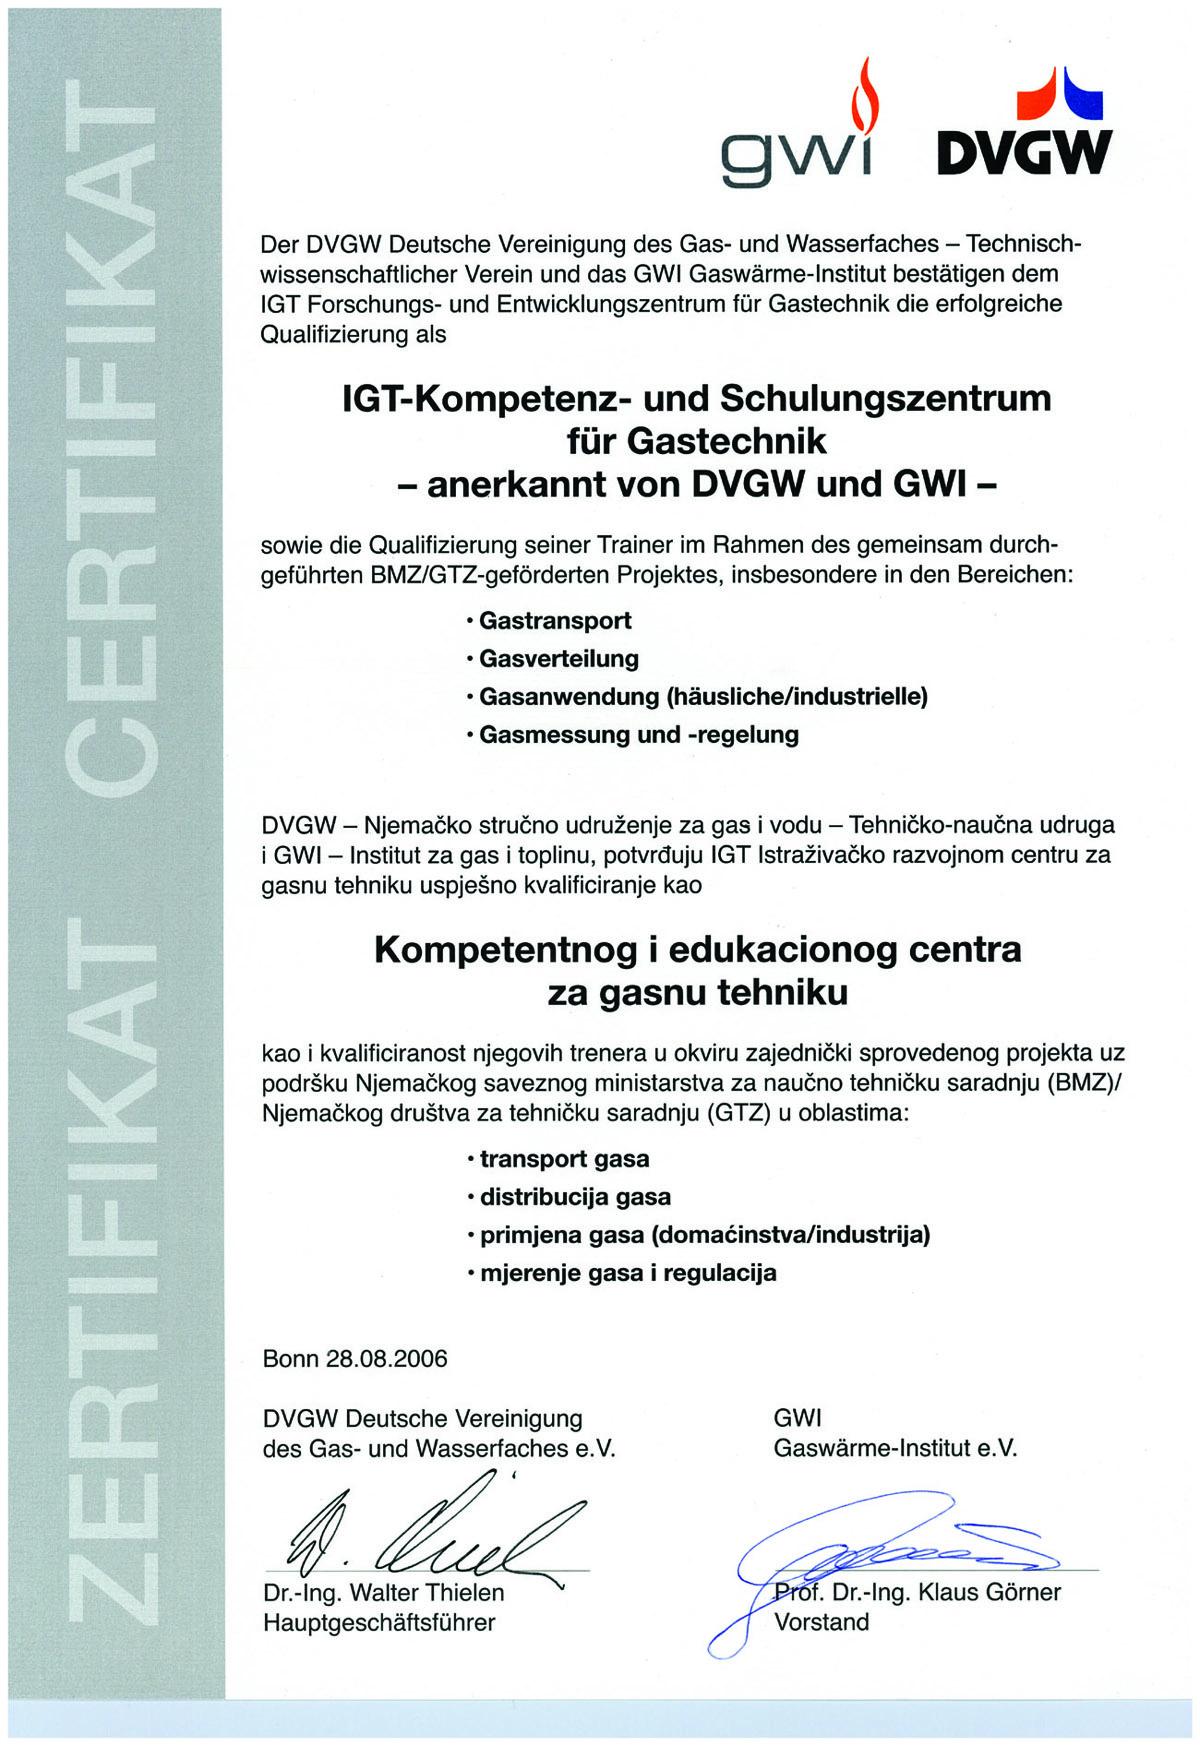 edukacioni centar certifikat